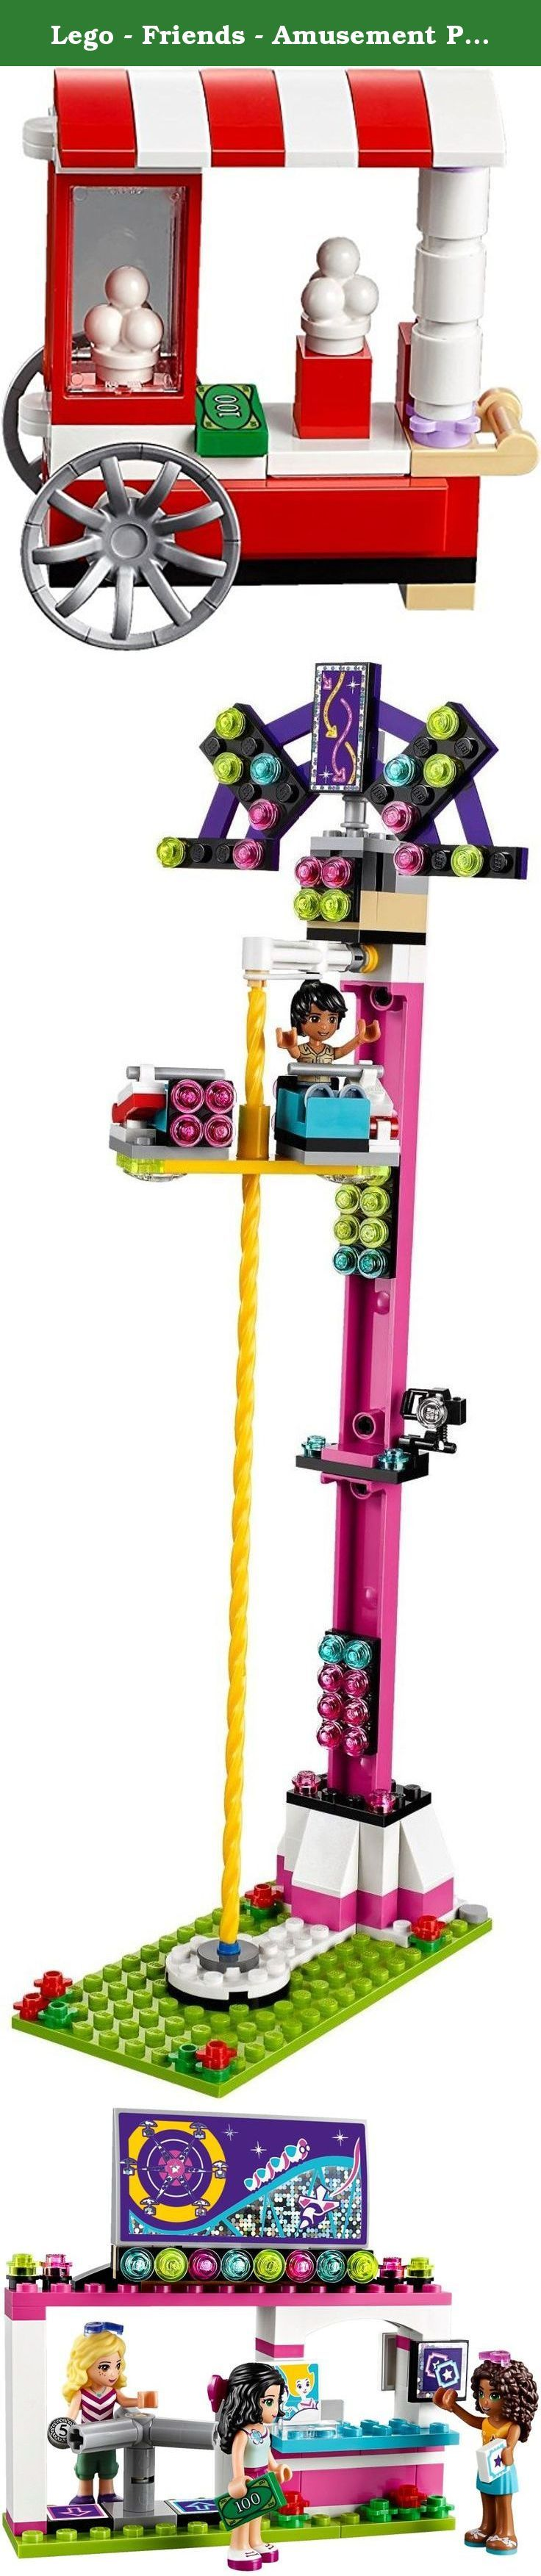 Lego - Friends - Amusement Park Roller Coaster 41130. Lego - Friends - Amusement Park Roller Coaster 41130.